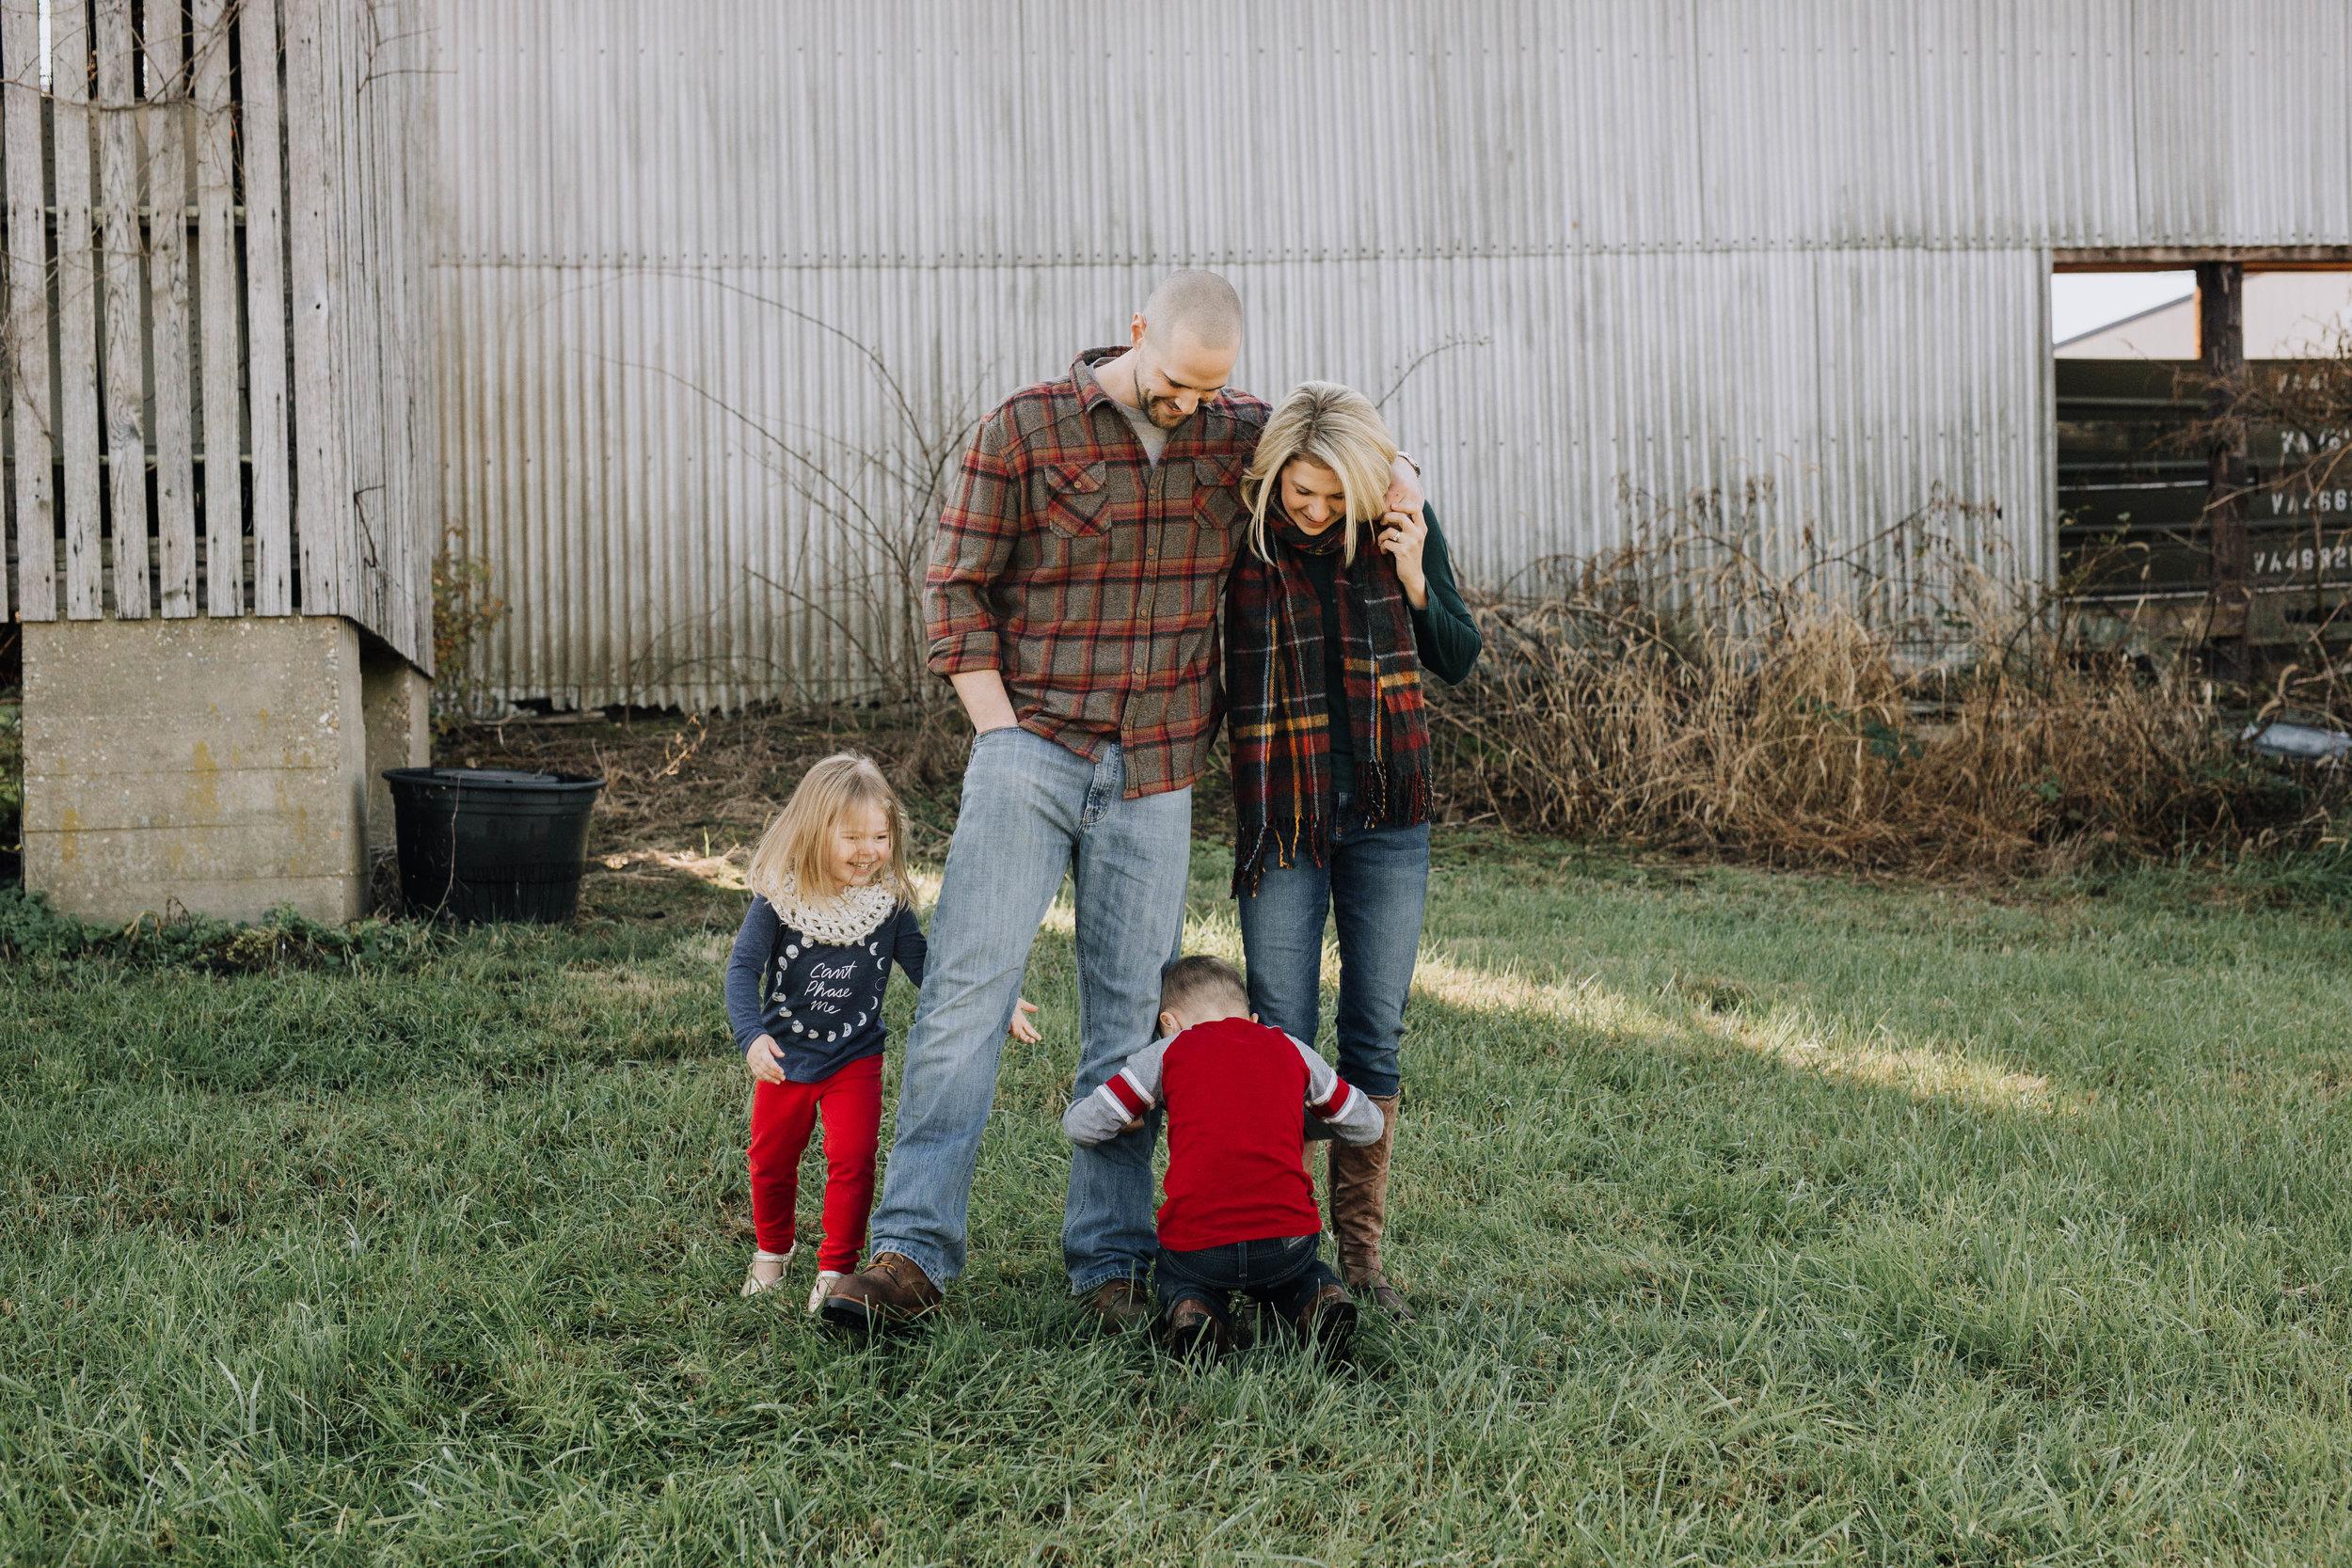 Lick_Run_Fredericksburg_Virginia_Jacqueline_Waters_Photography_Basham_Family_Portraits (149).jpg